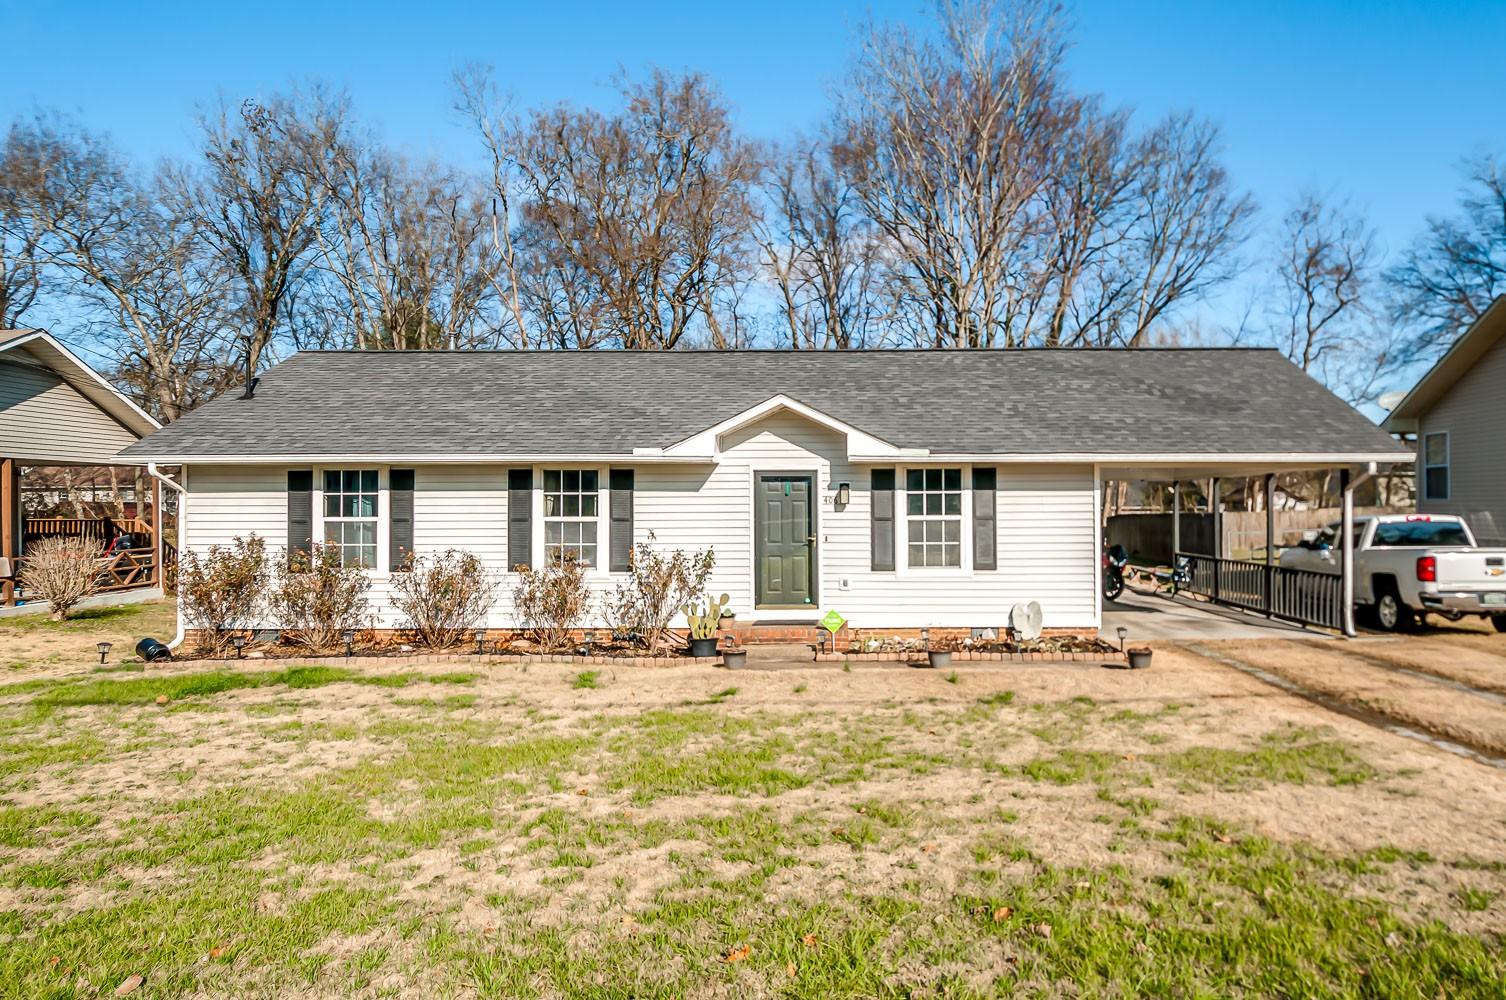 406 Chapman Ln Property Photo - Columbia, TN real estate listing